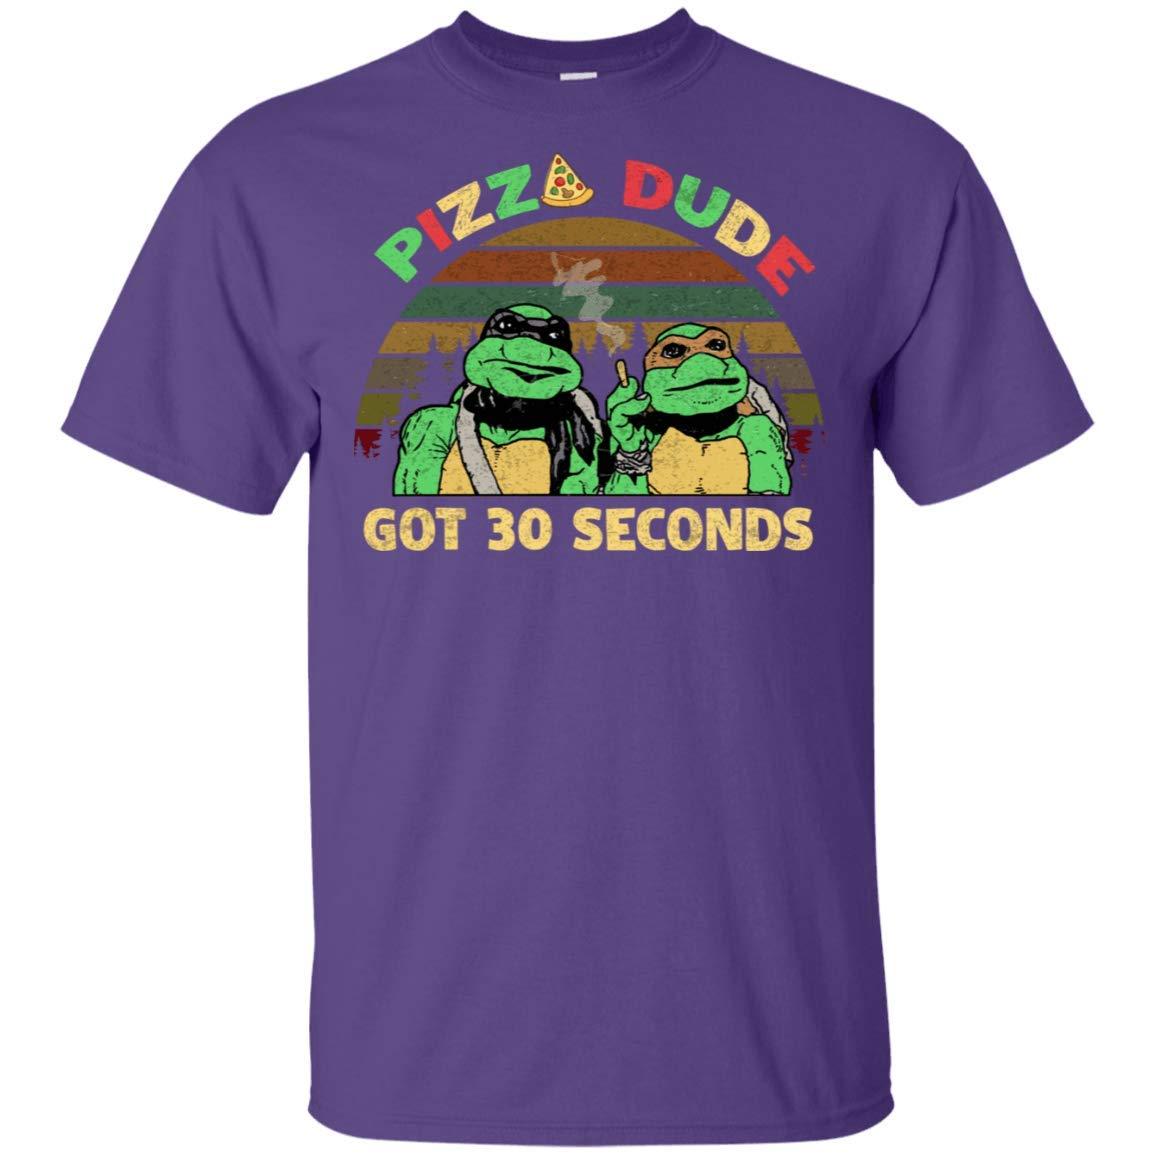 Vintage Pizza Dude Got 30 Seconds T-Shirt for Ninja Turtles Lovers